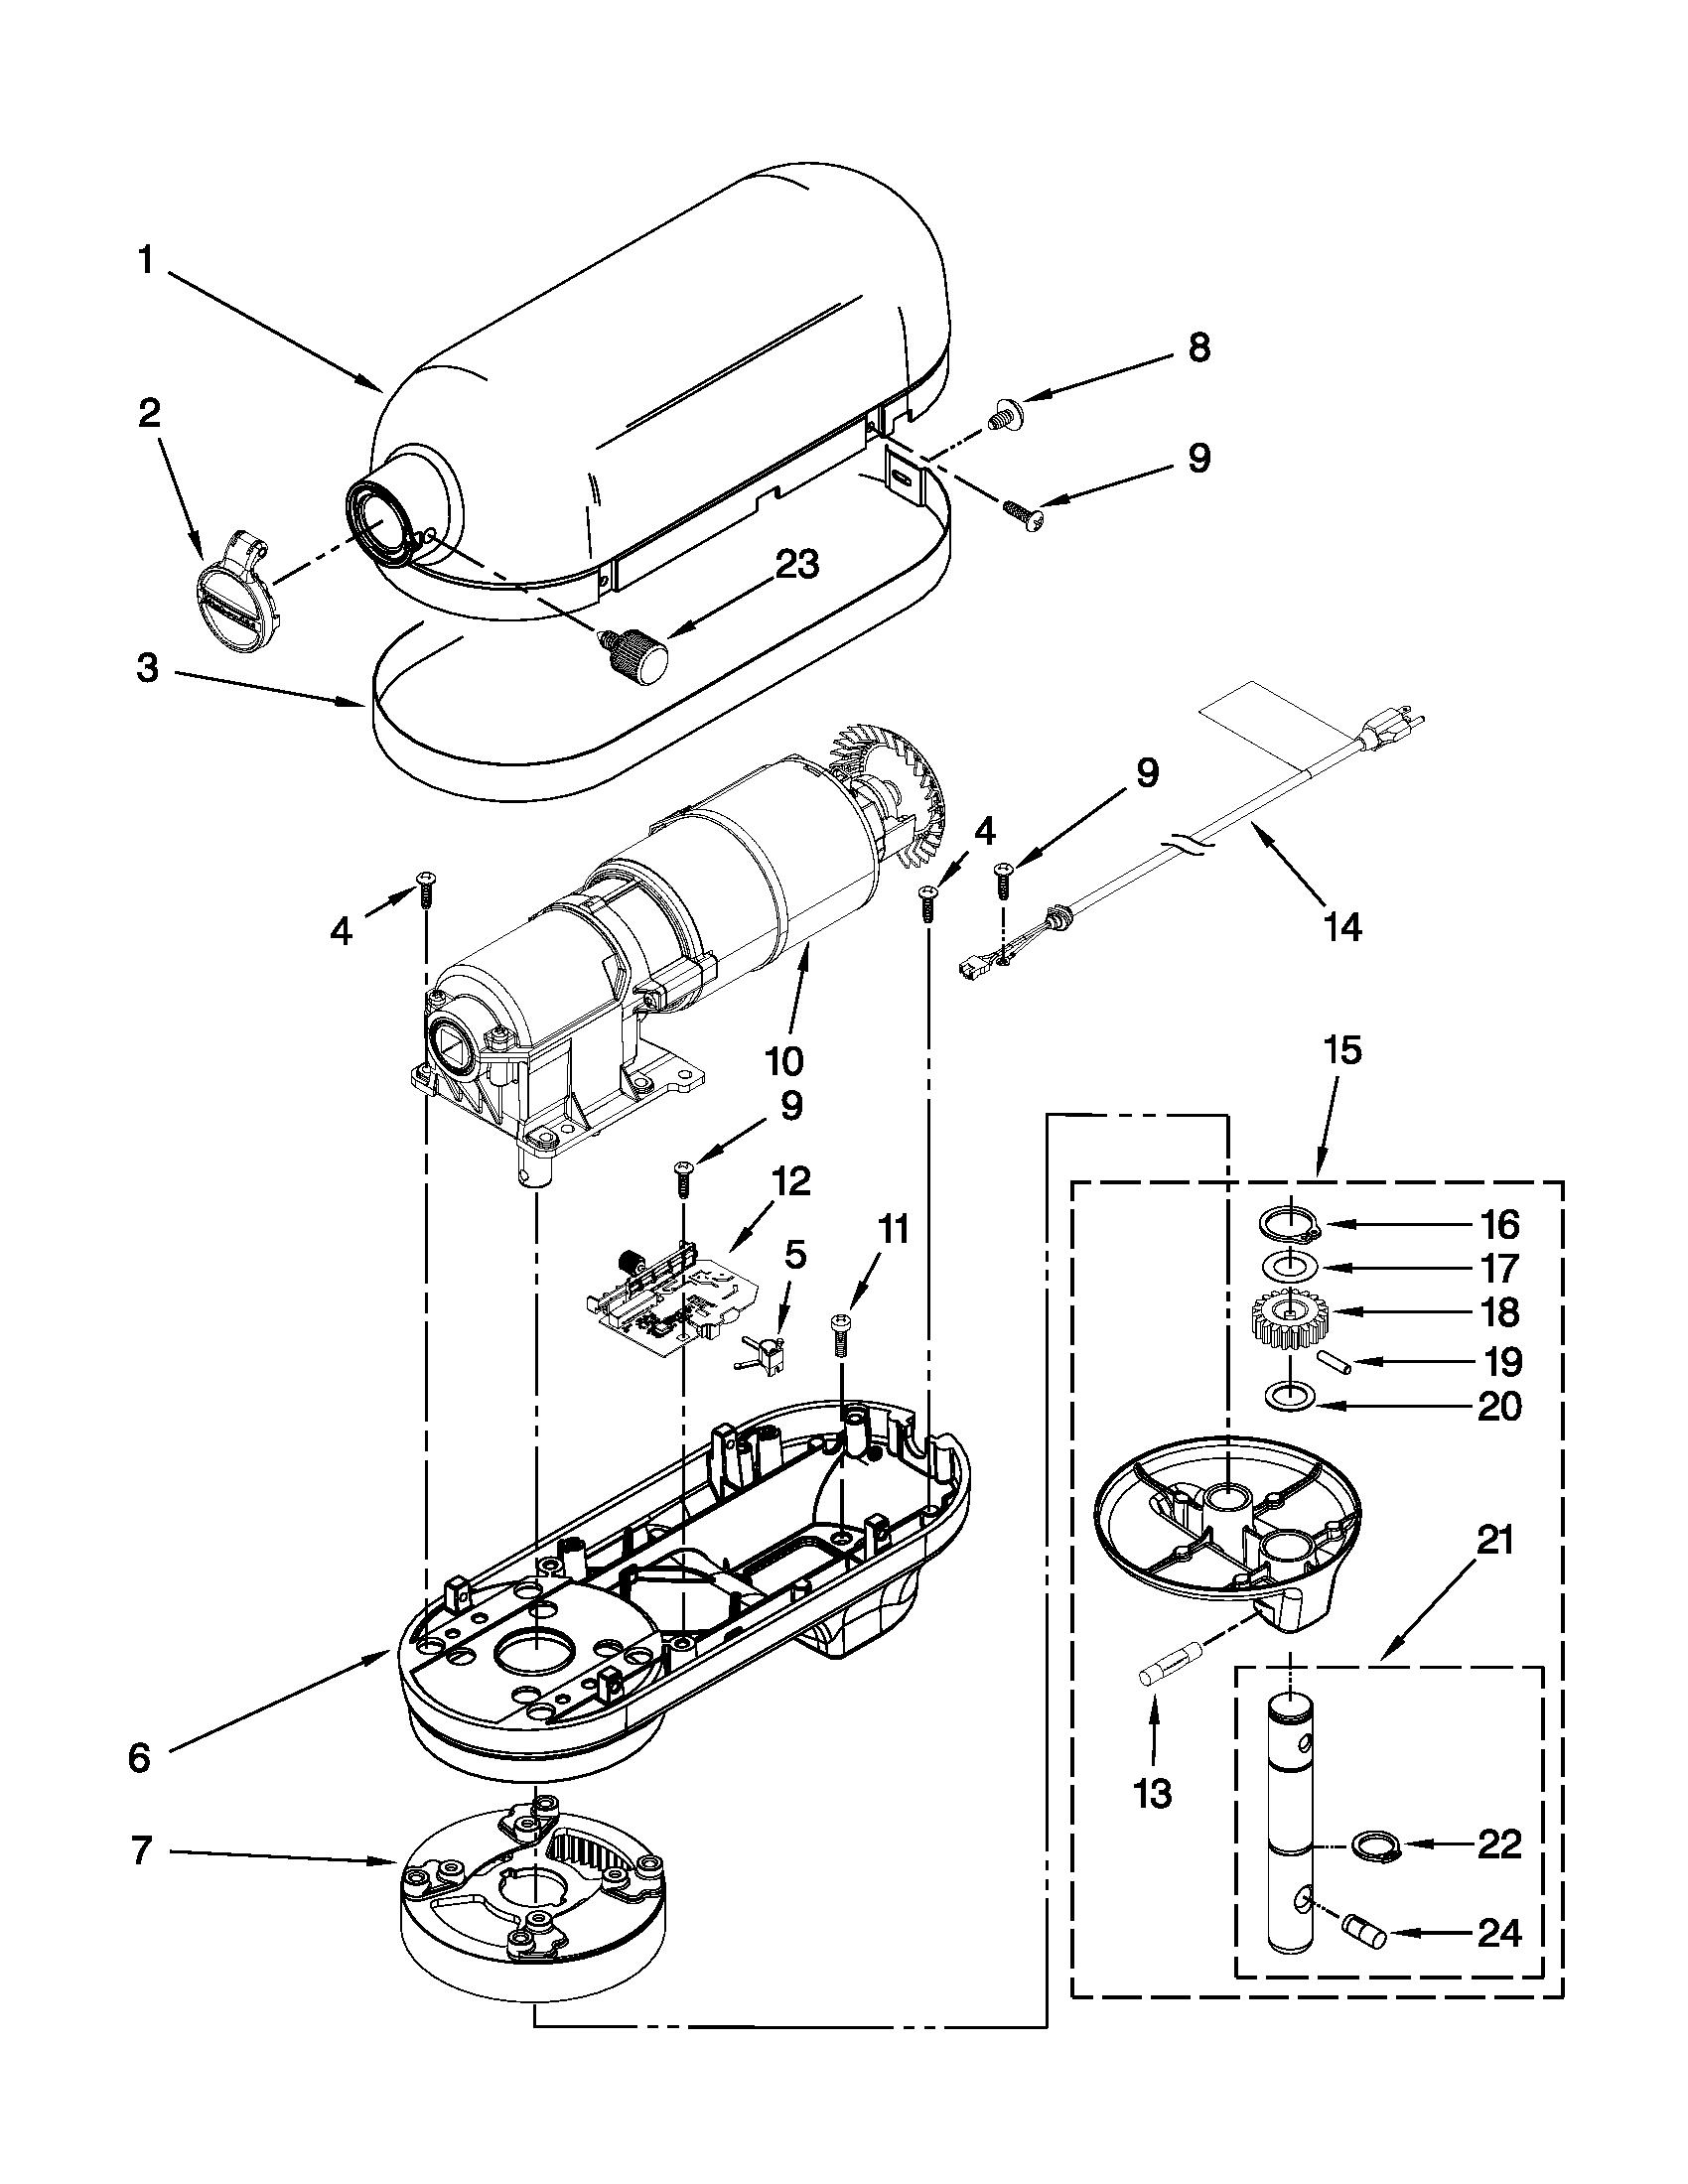 3 Phase Motor Troubleshooting DC Motor Troubleshooting